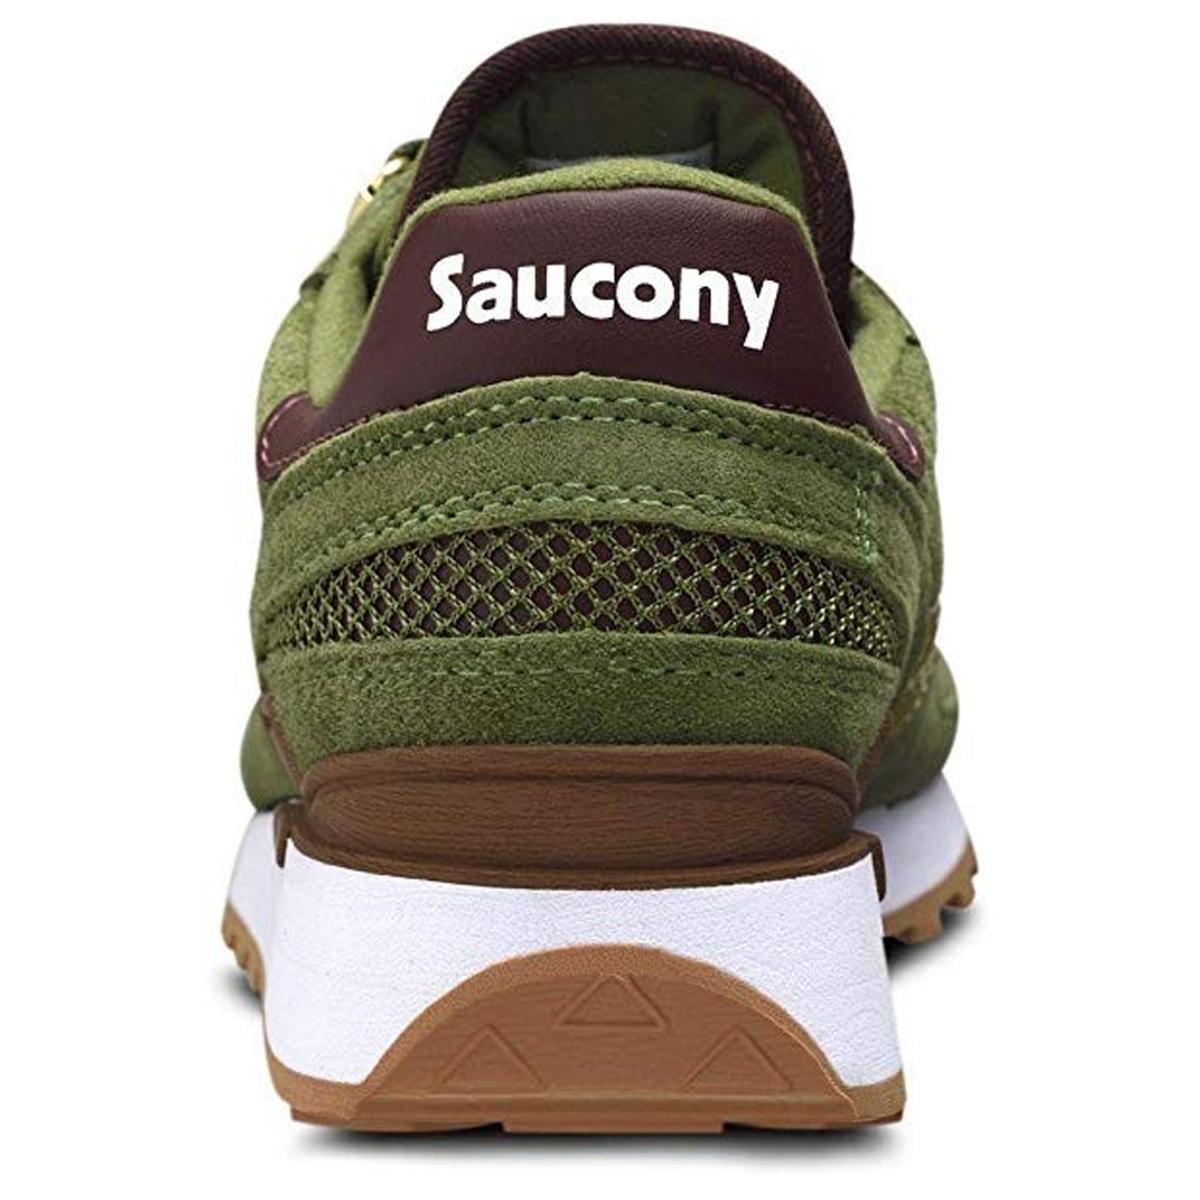 Scarpe Sneakers Saucony Shadow Original Limited Edition Uomo Rif. S70420-3